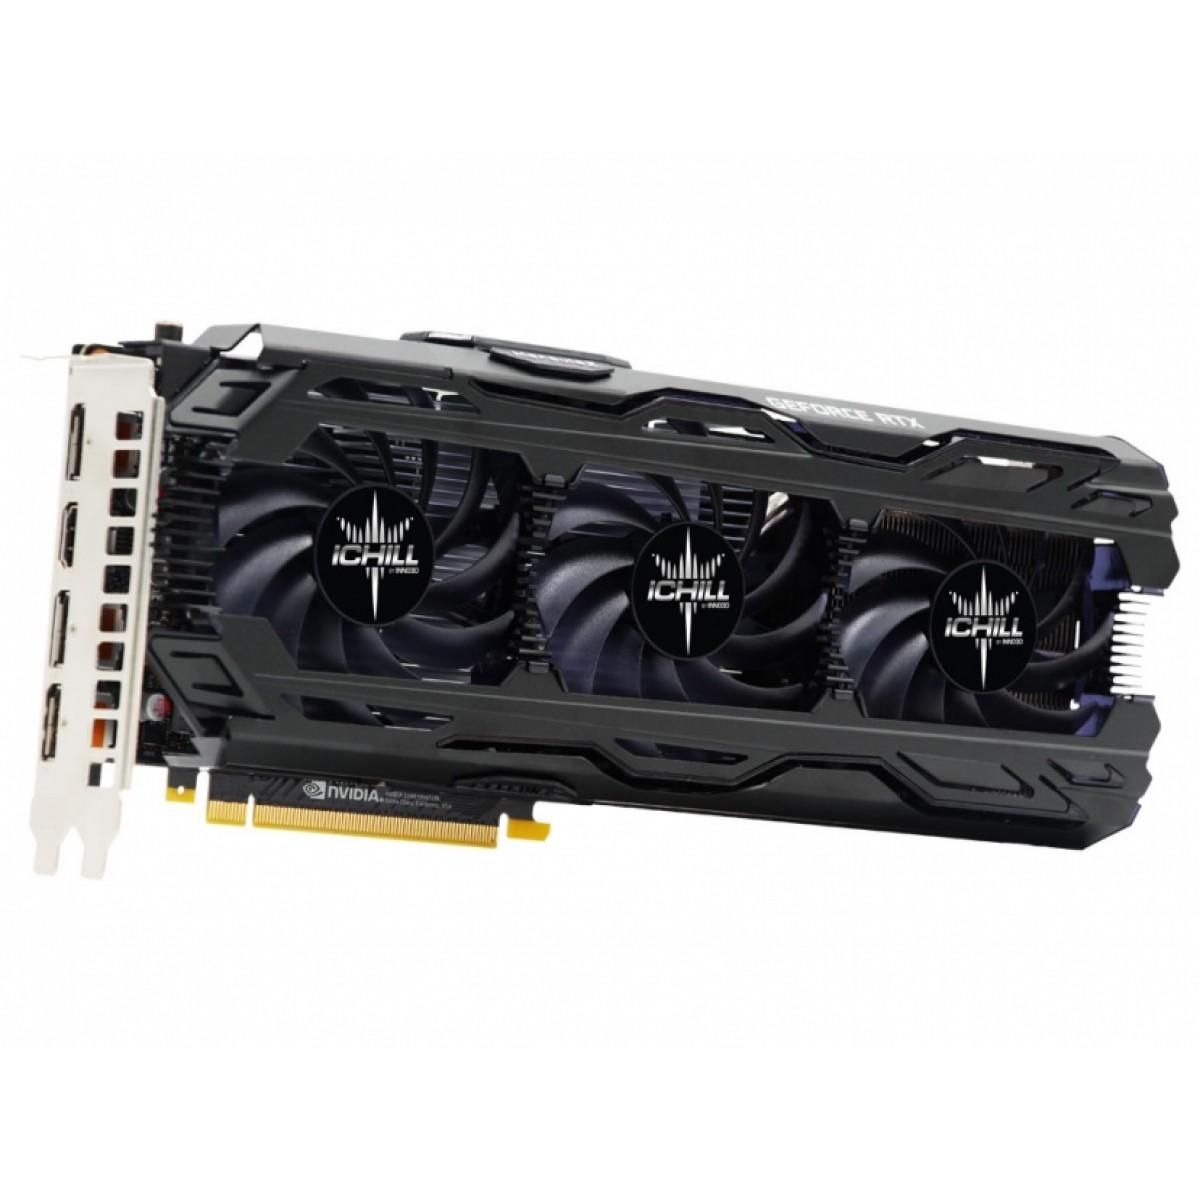 Placa de Vídeo Inno3D GeForce RTX 2060 Super iChill X3, 8GB GDDR6, 256Bit, C206S3-08D6X-1740VA28